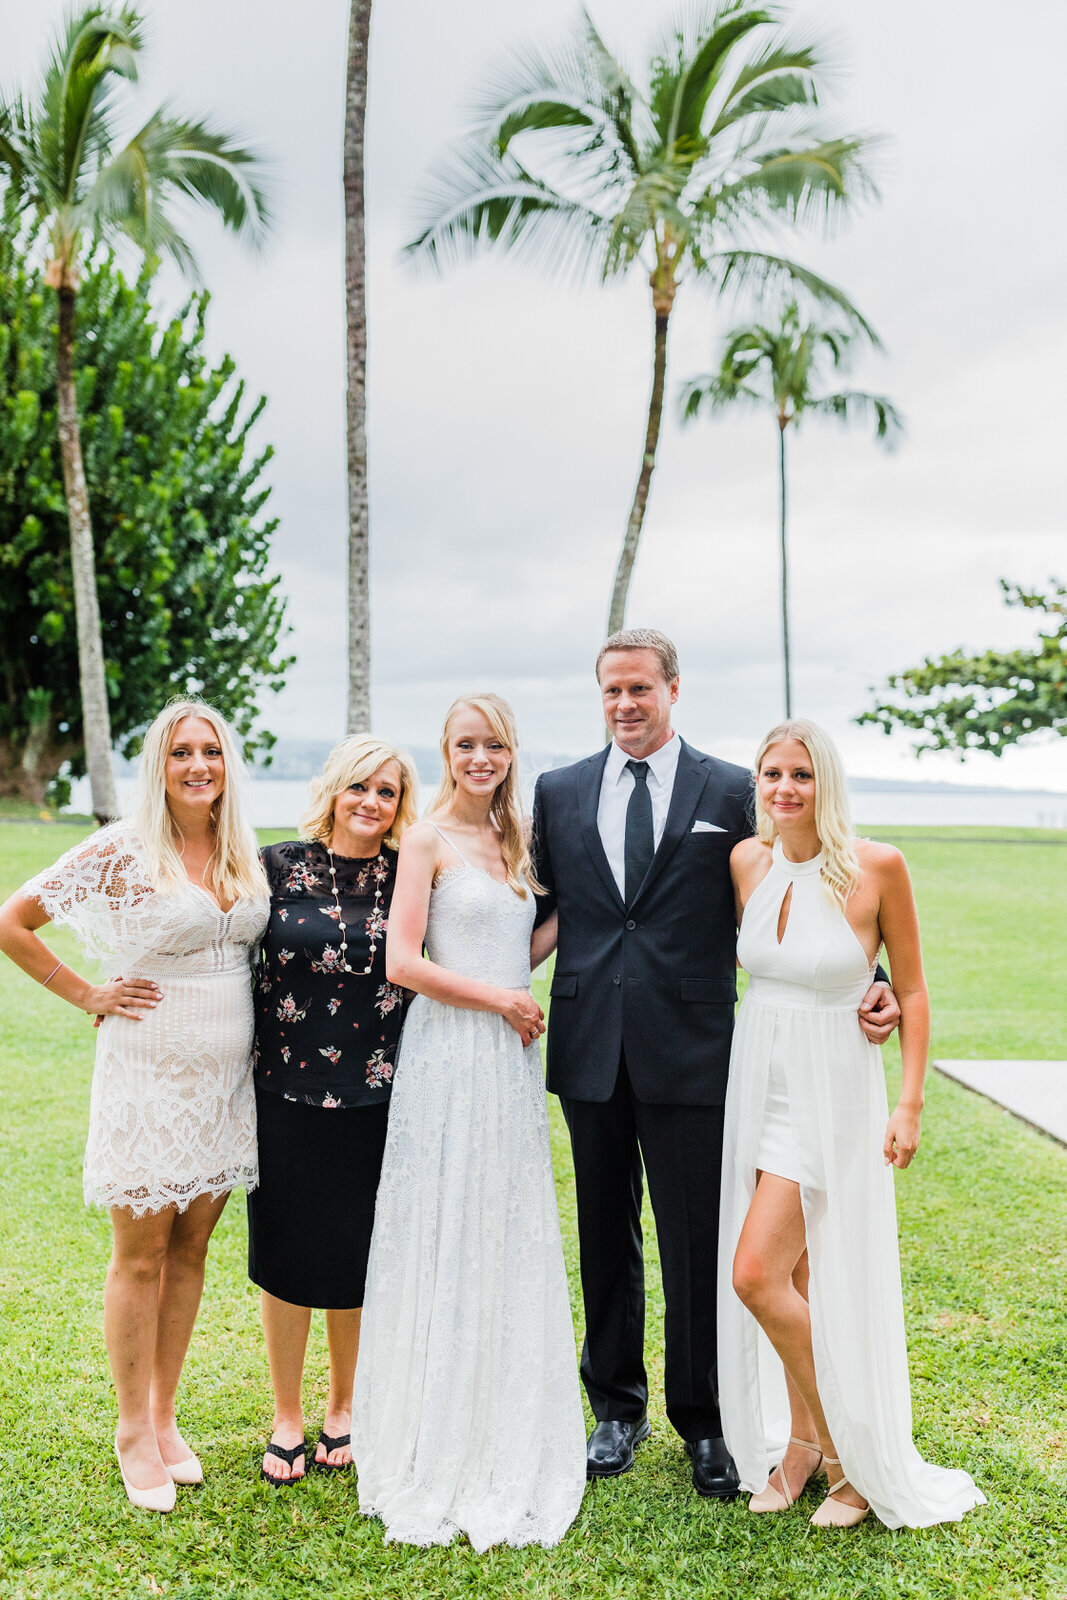 small-wedding-hawaii-destination-hilton-coconut-island-0313.jpg